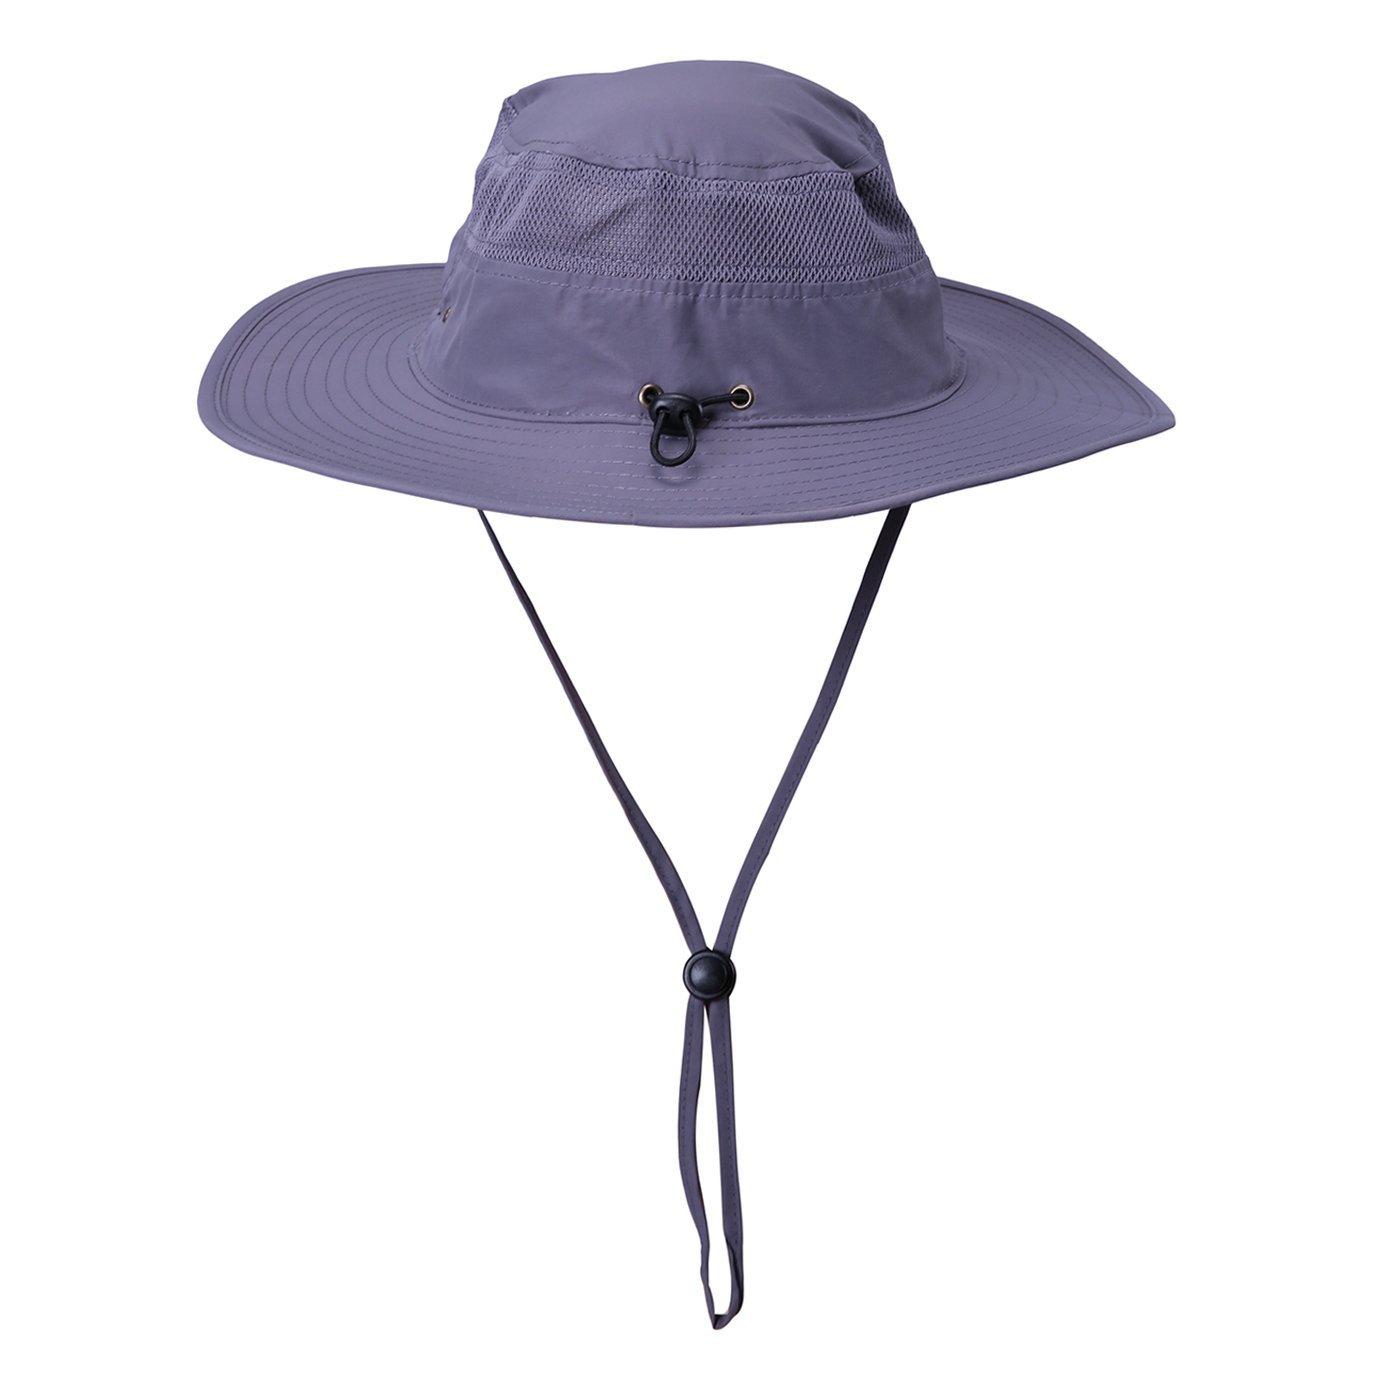 HDE Mens Mesh Bucket Hat Outdoor UV Sun Protection Wide Brim Booney Fishing Cap